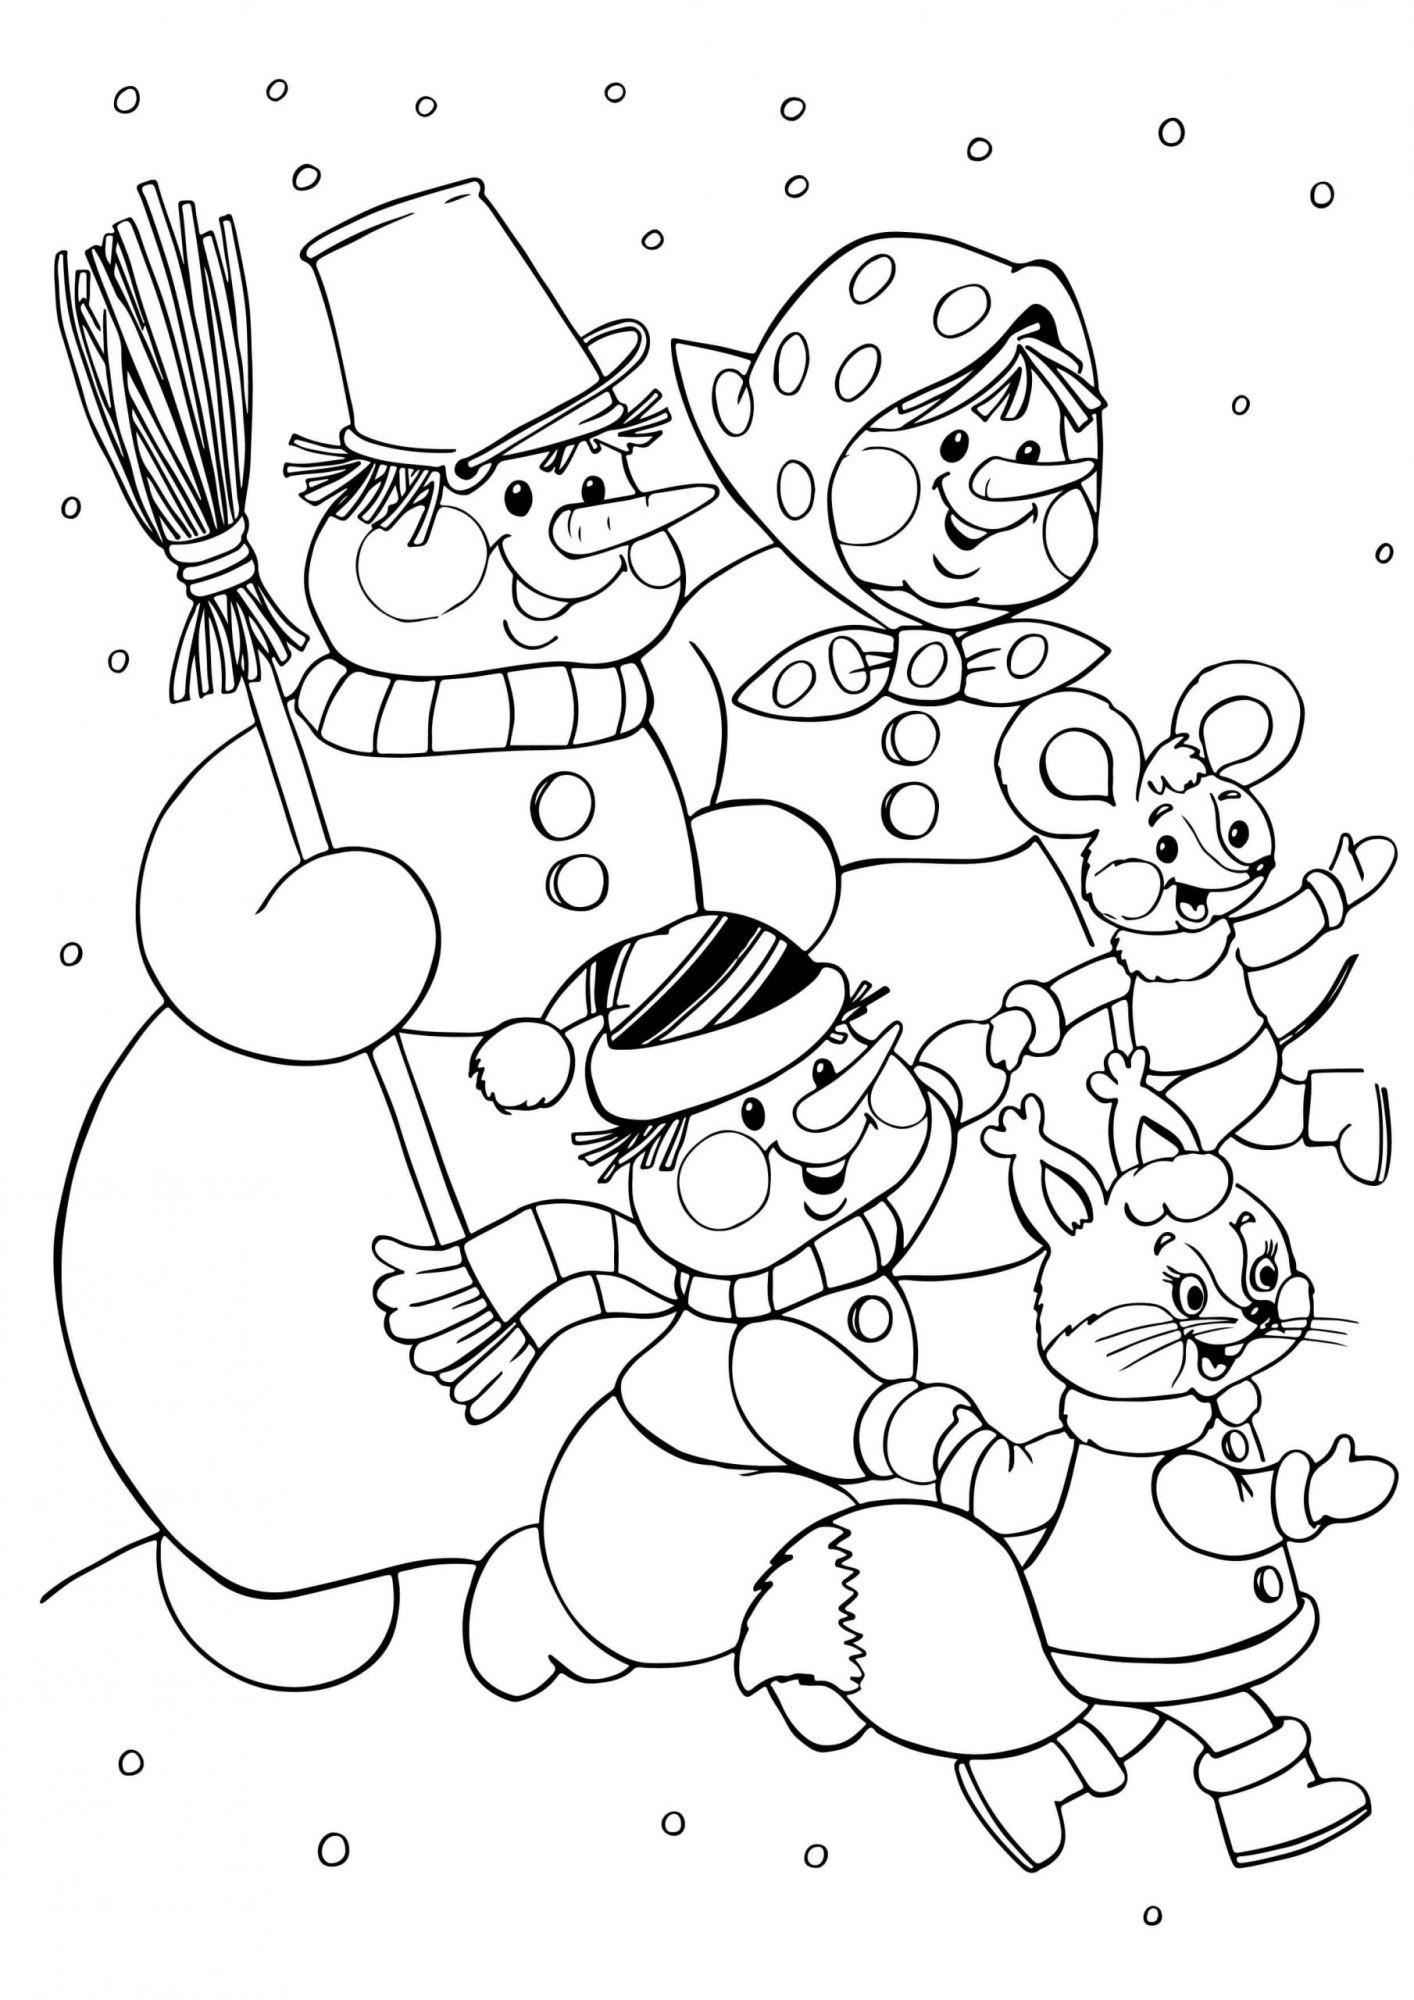 Раскраска Новый год